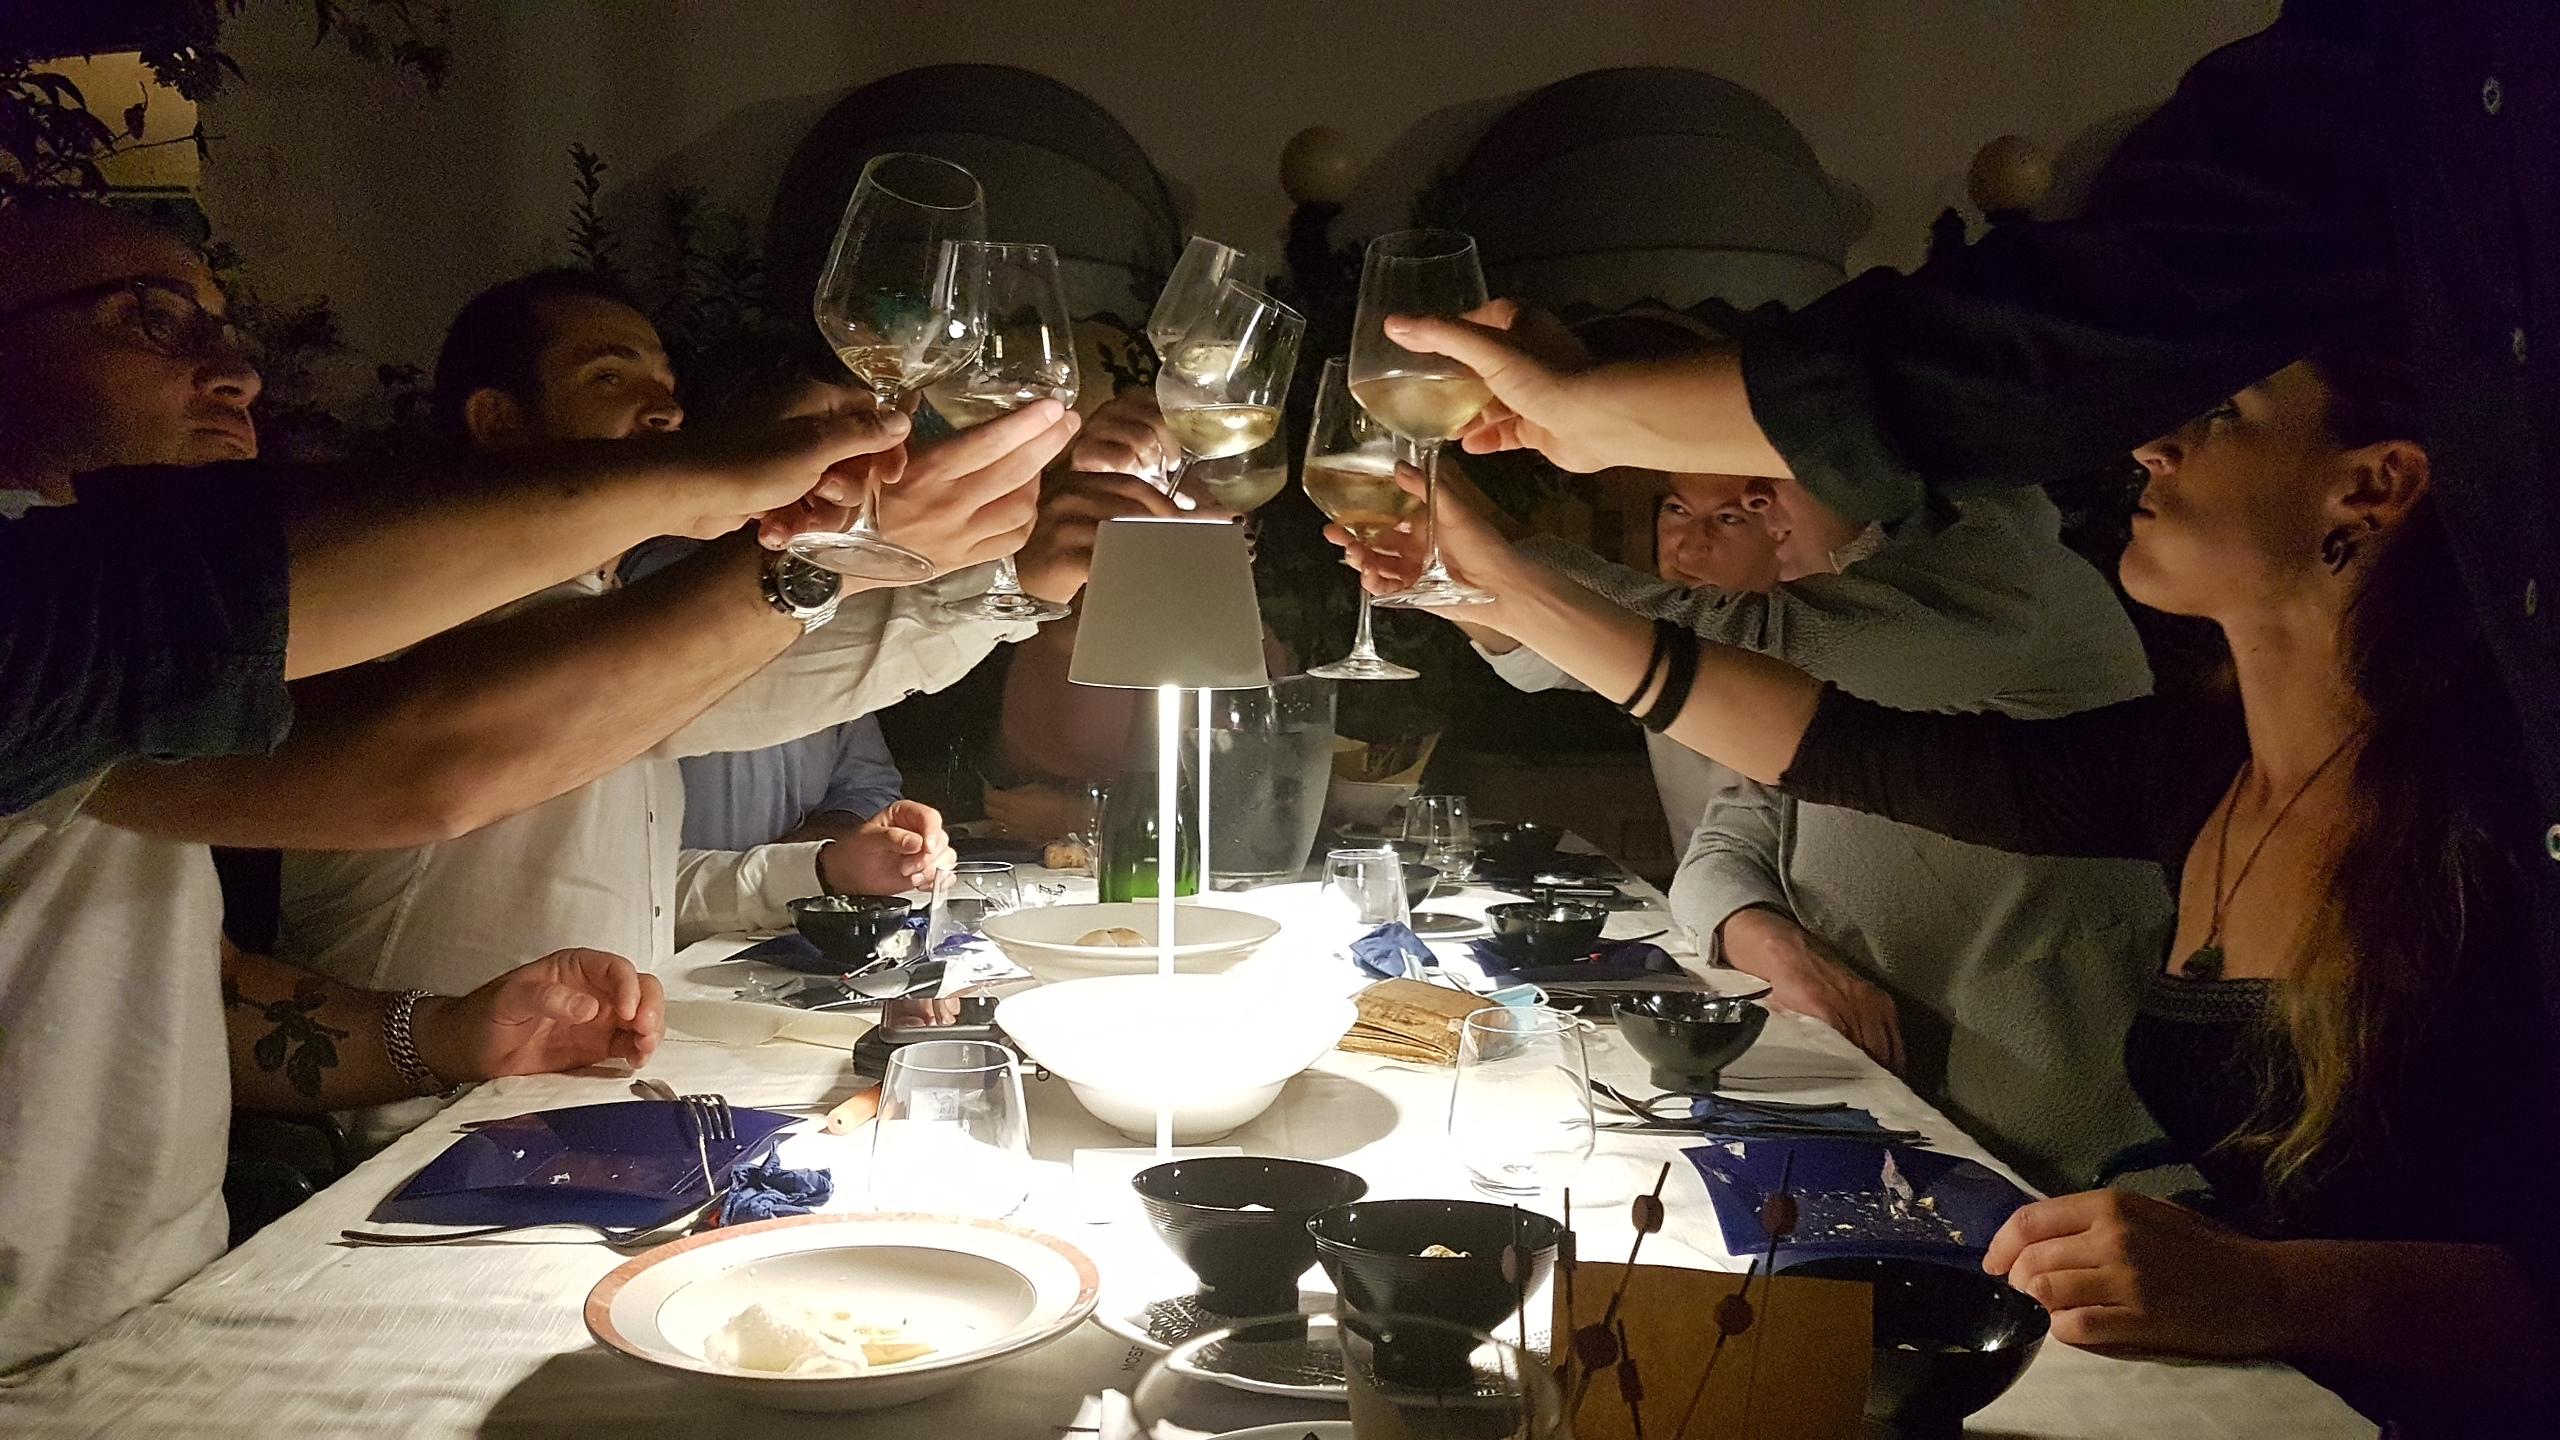 degustazione-vini-trento-doc-moser-